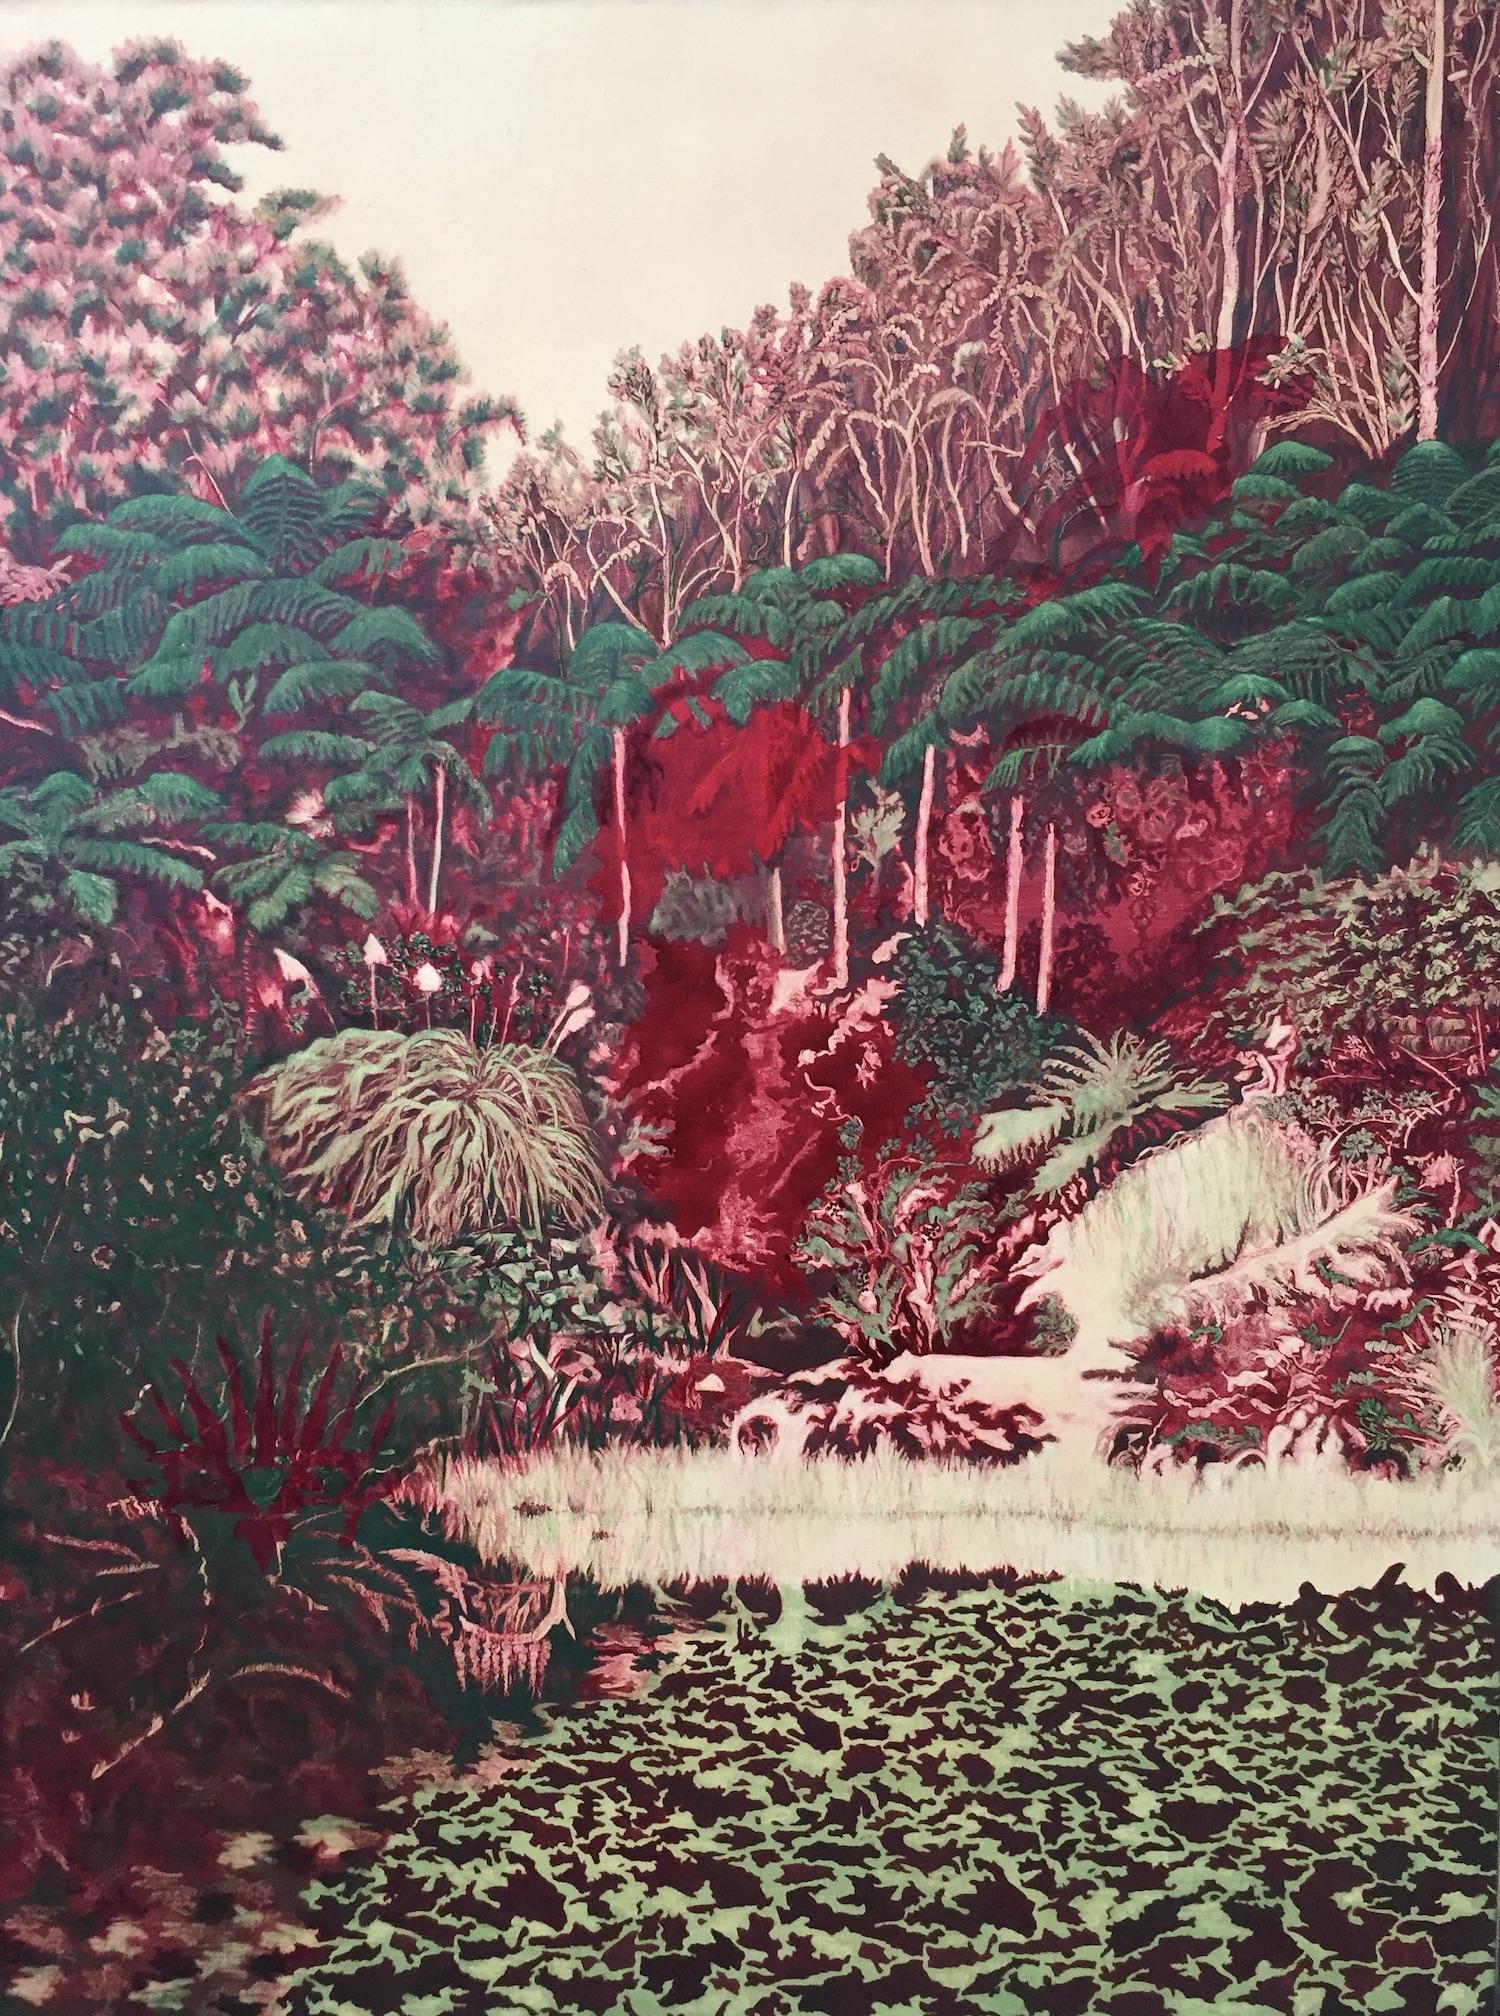 Pukekura. Robyn Litchfield. Jackson's Painting Prize.